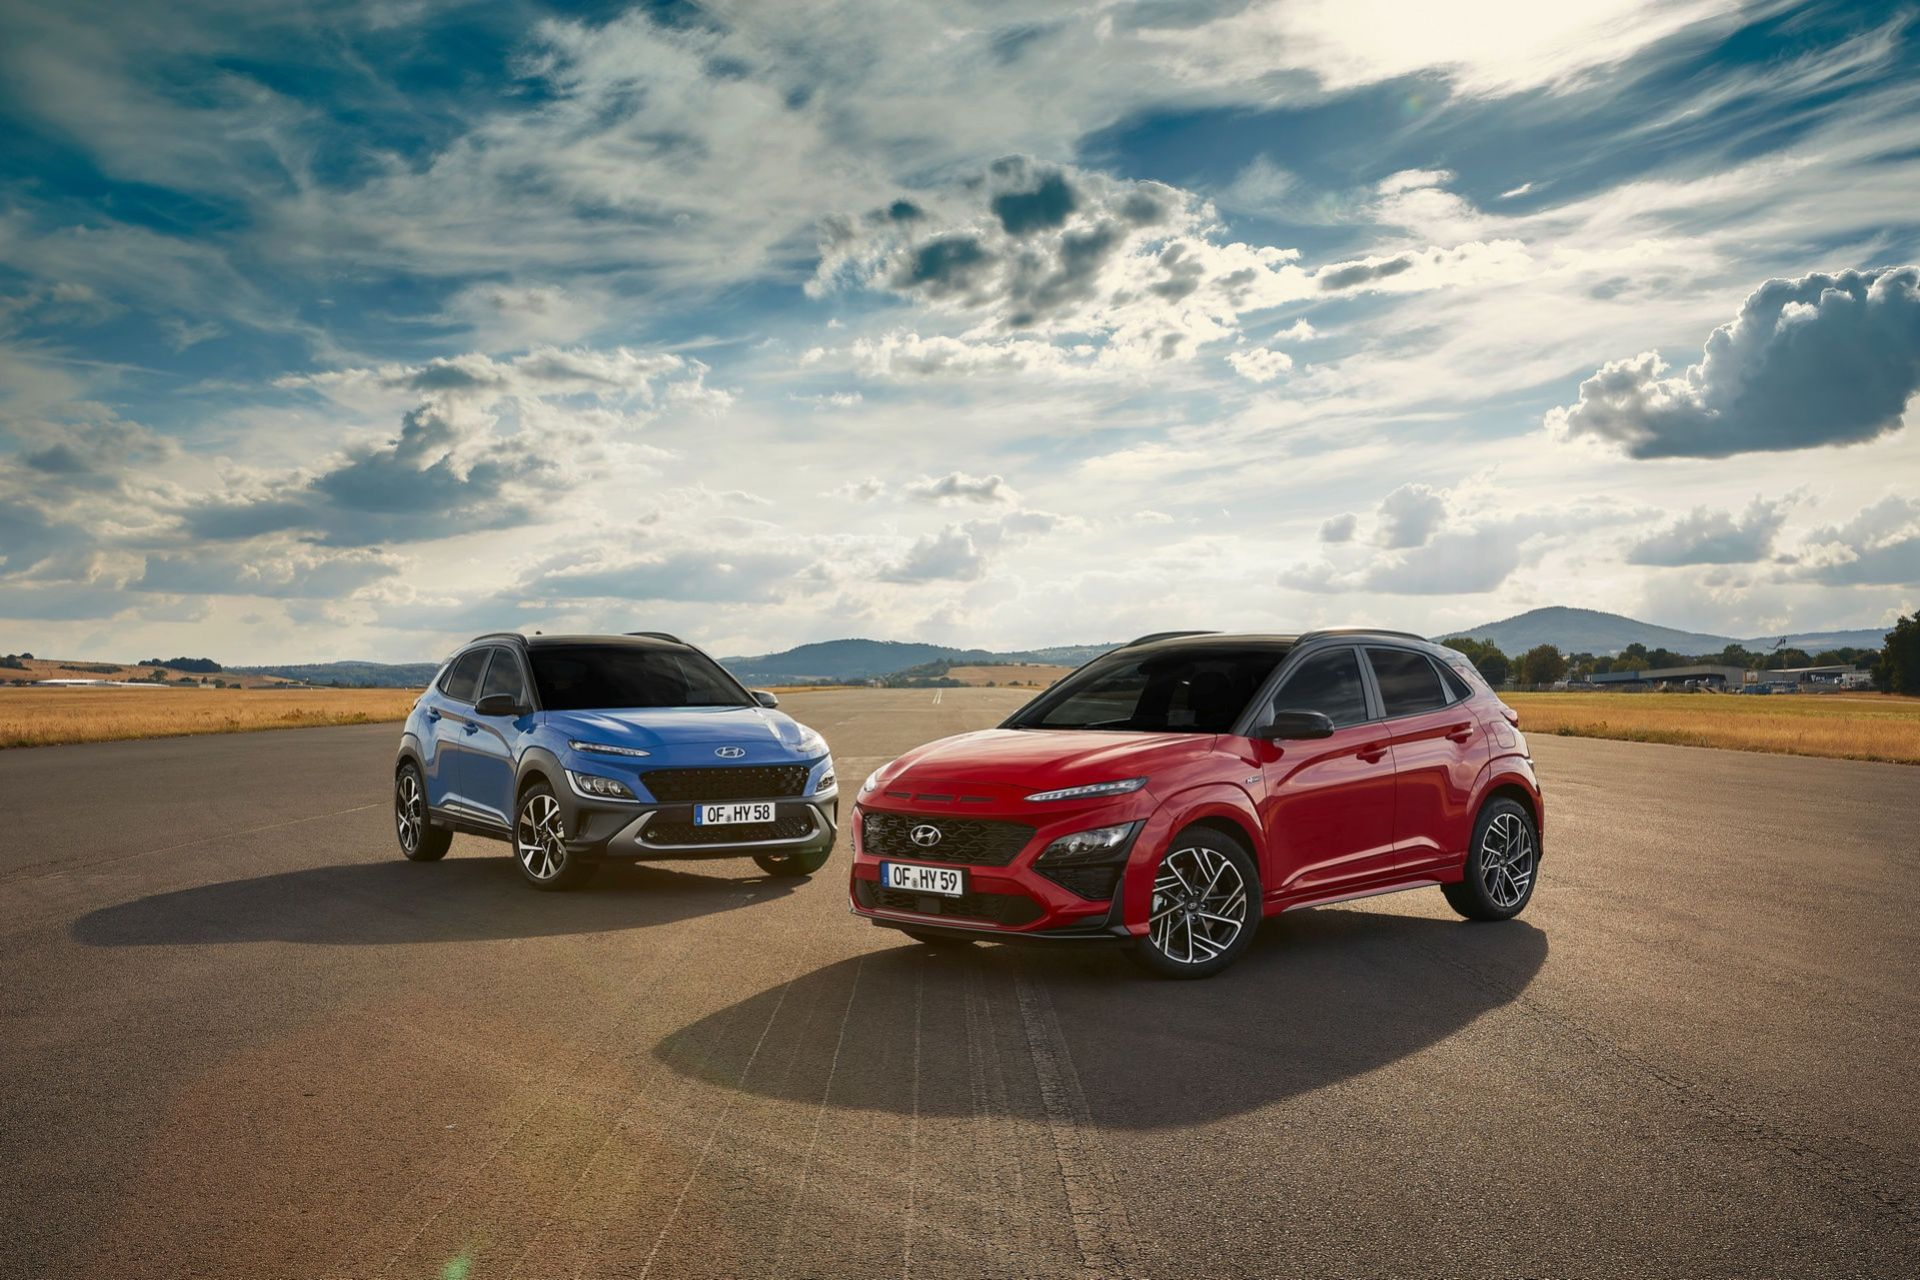 Hyundai uppdaterar Kona